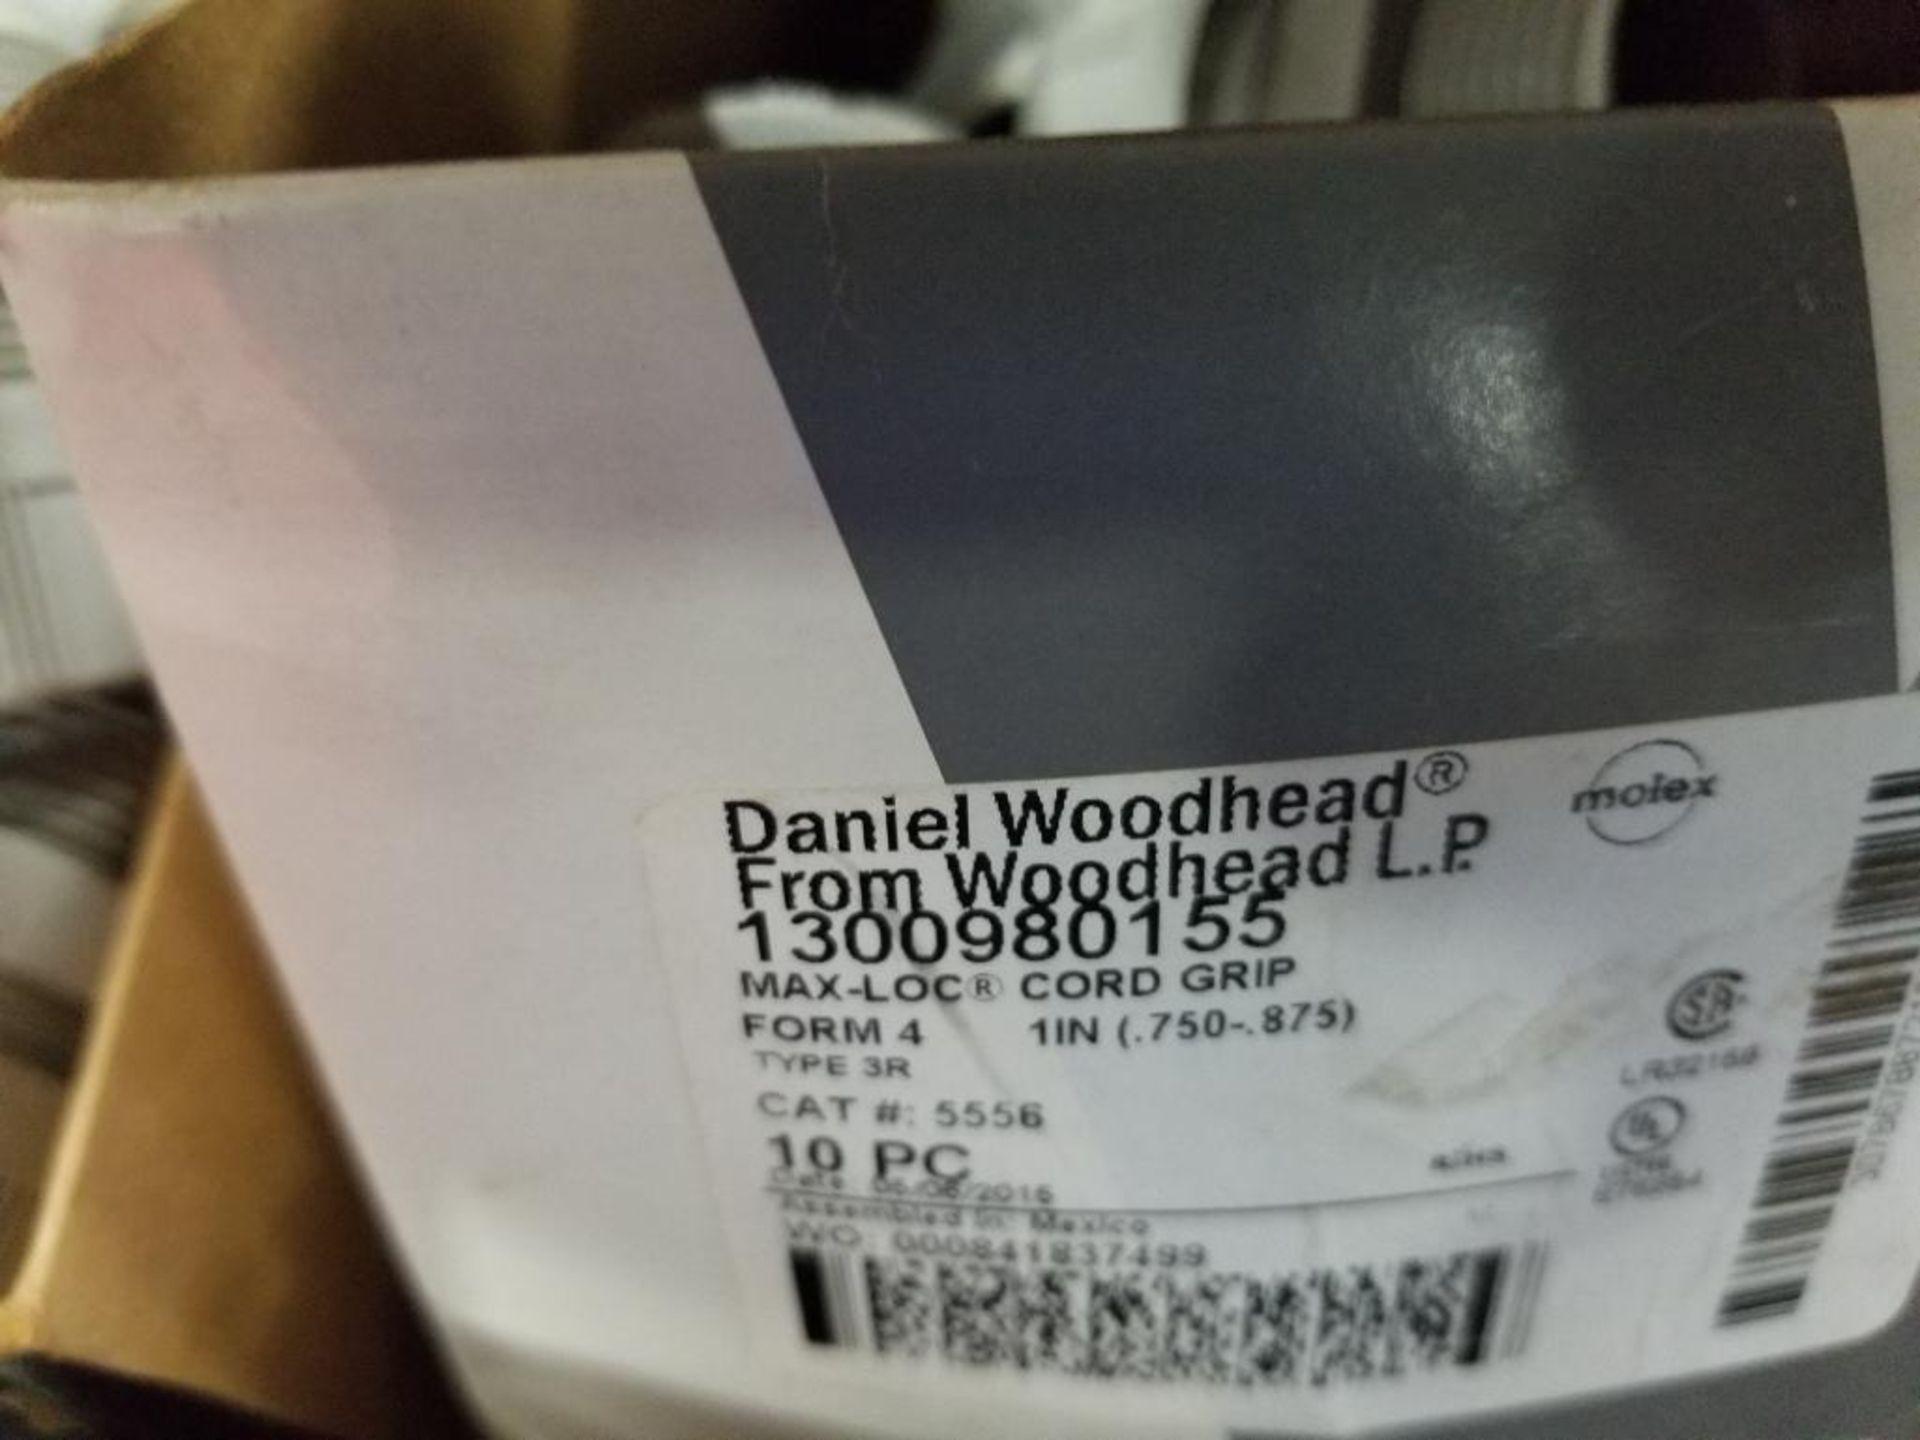 Daniel Woodhead Max-Loc hose connectors. - Image 2 of 5